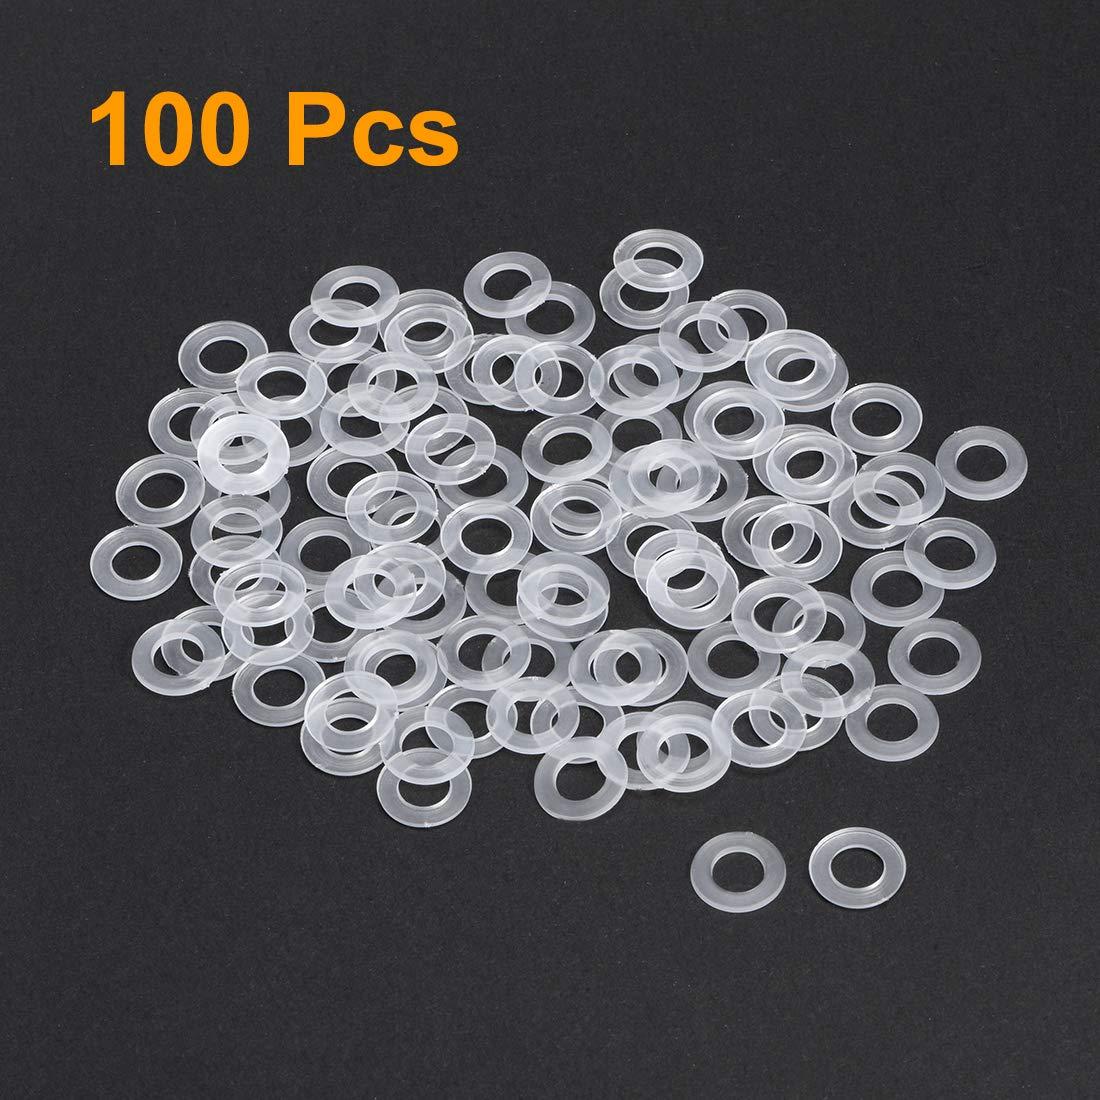 sourcing map arandelas planas de nylon para tornillo m4 tornillo 13mm od 1mm espesor claro 300pcs